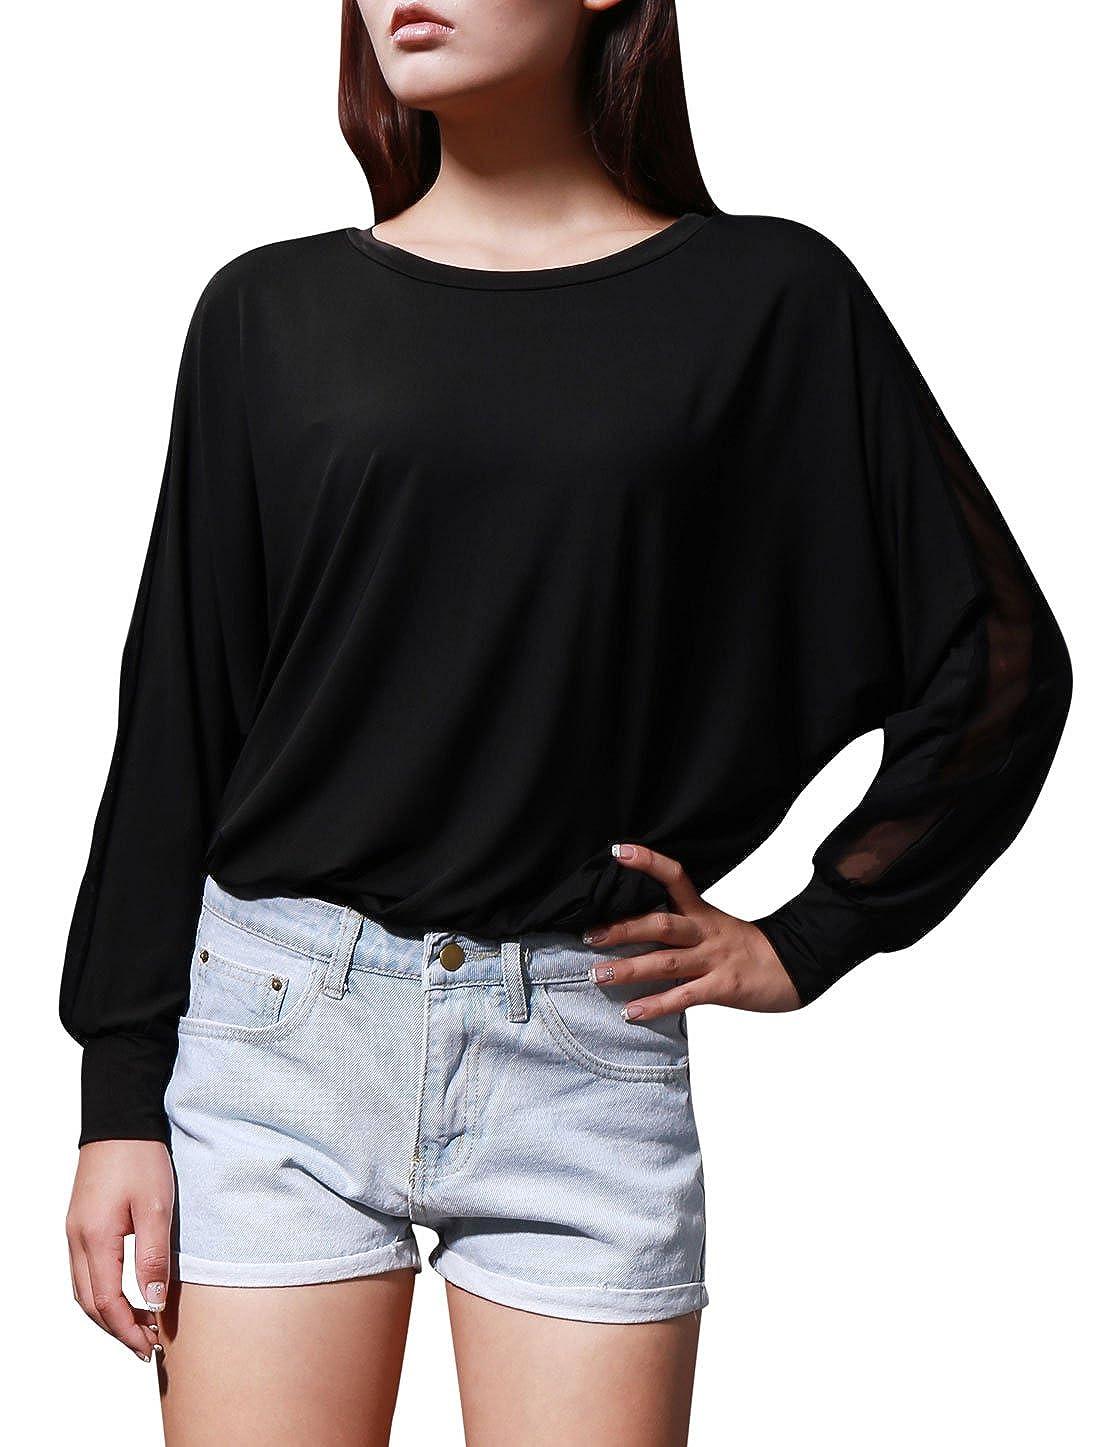 Allegra K Mujer Panel De Malla Chaqueta Camisas Manga Murciélago Top Holgado Blusas - sintético, Negro, 5% spandex 5% spandex\n 95% poliéster, niñas, ...